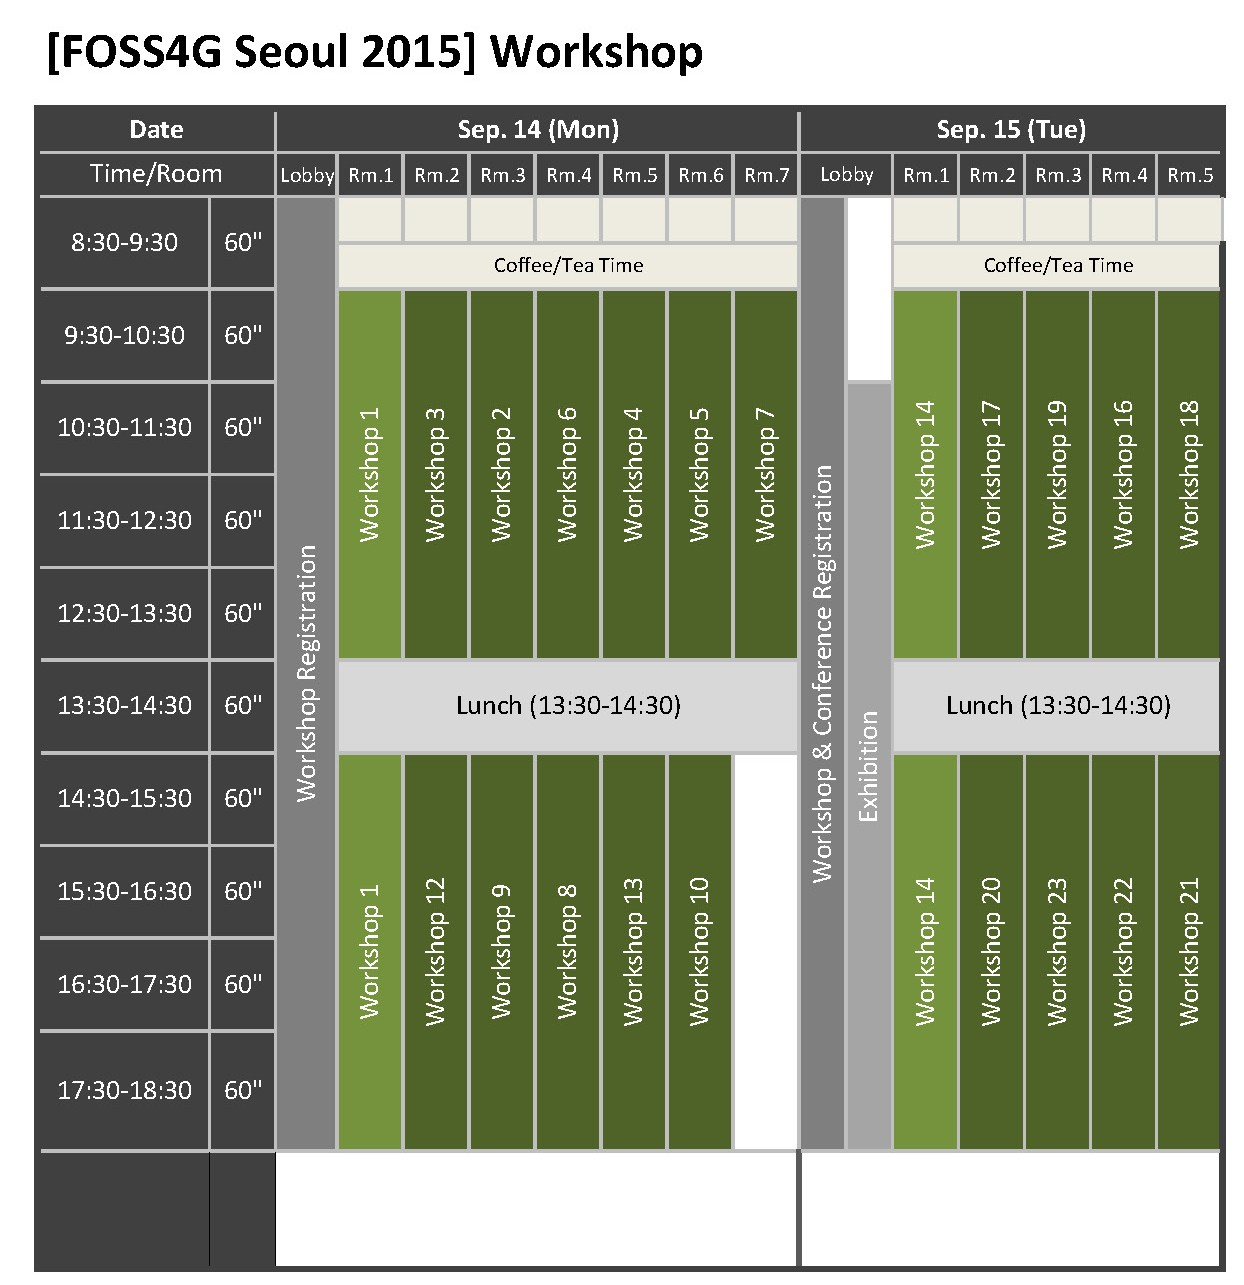 FOSS4G Seoul 2015_Programme at a Glance_페이지_1